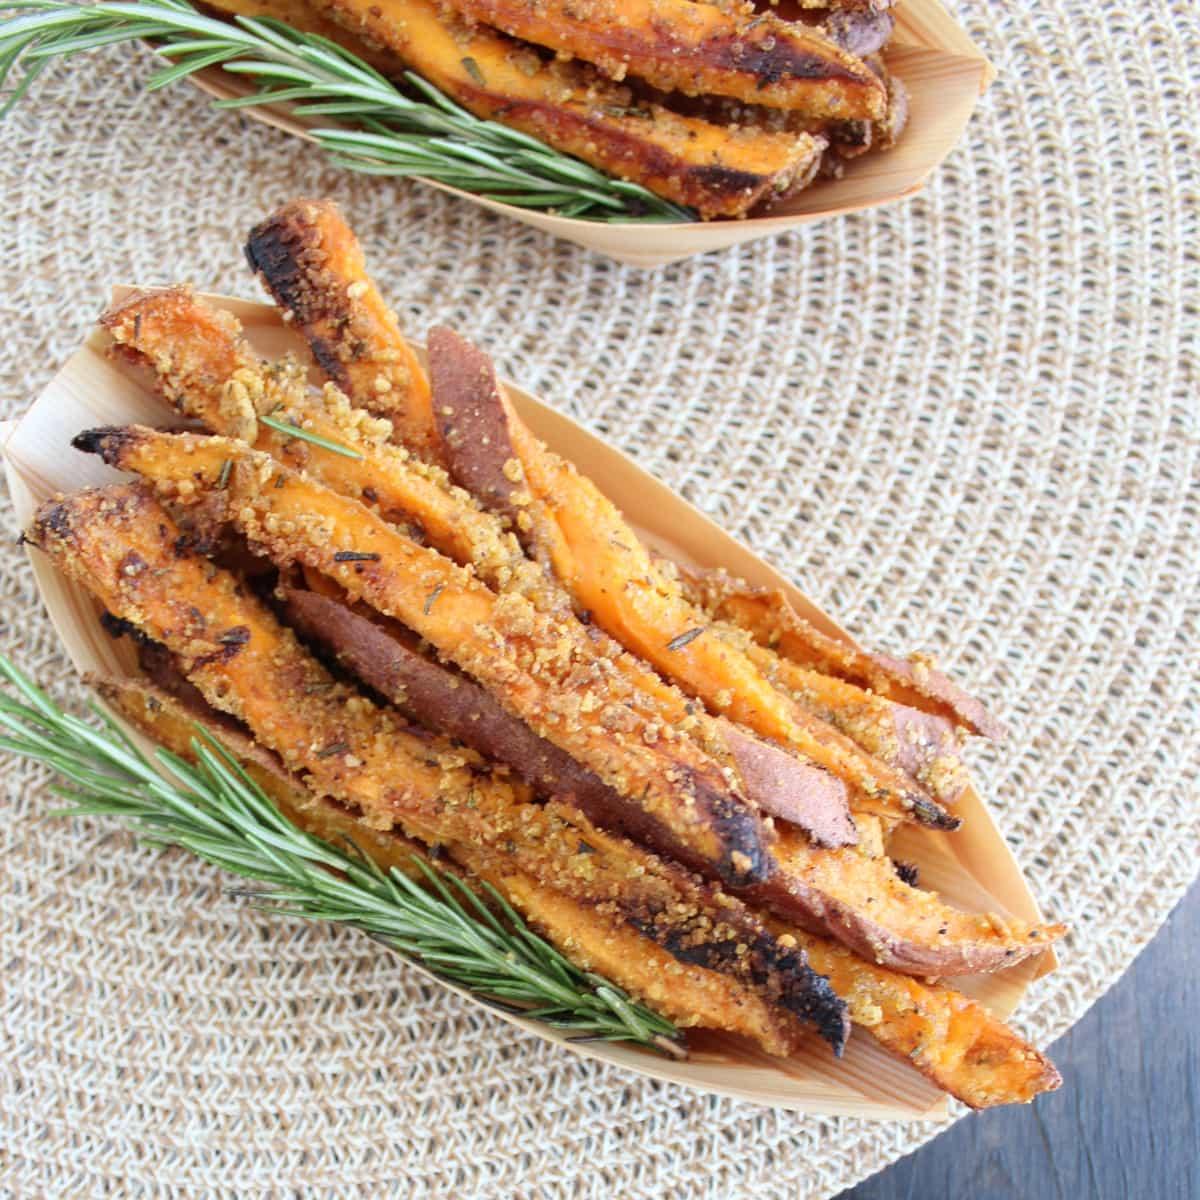 Crispy Rosemary Parmesan Baked Sweet Potato Fries